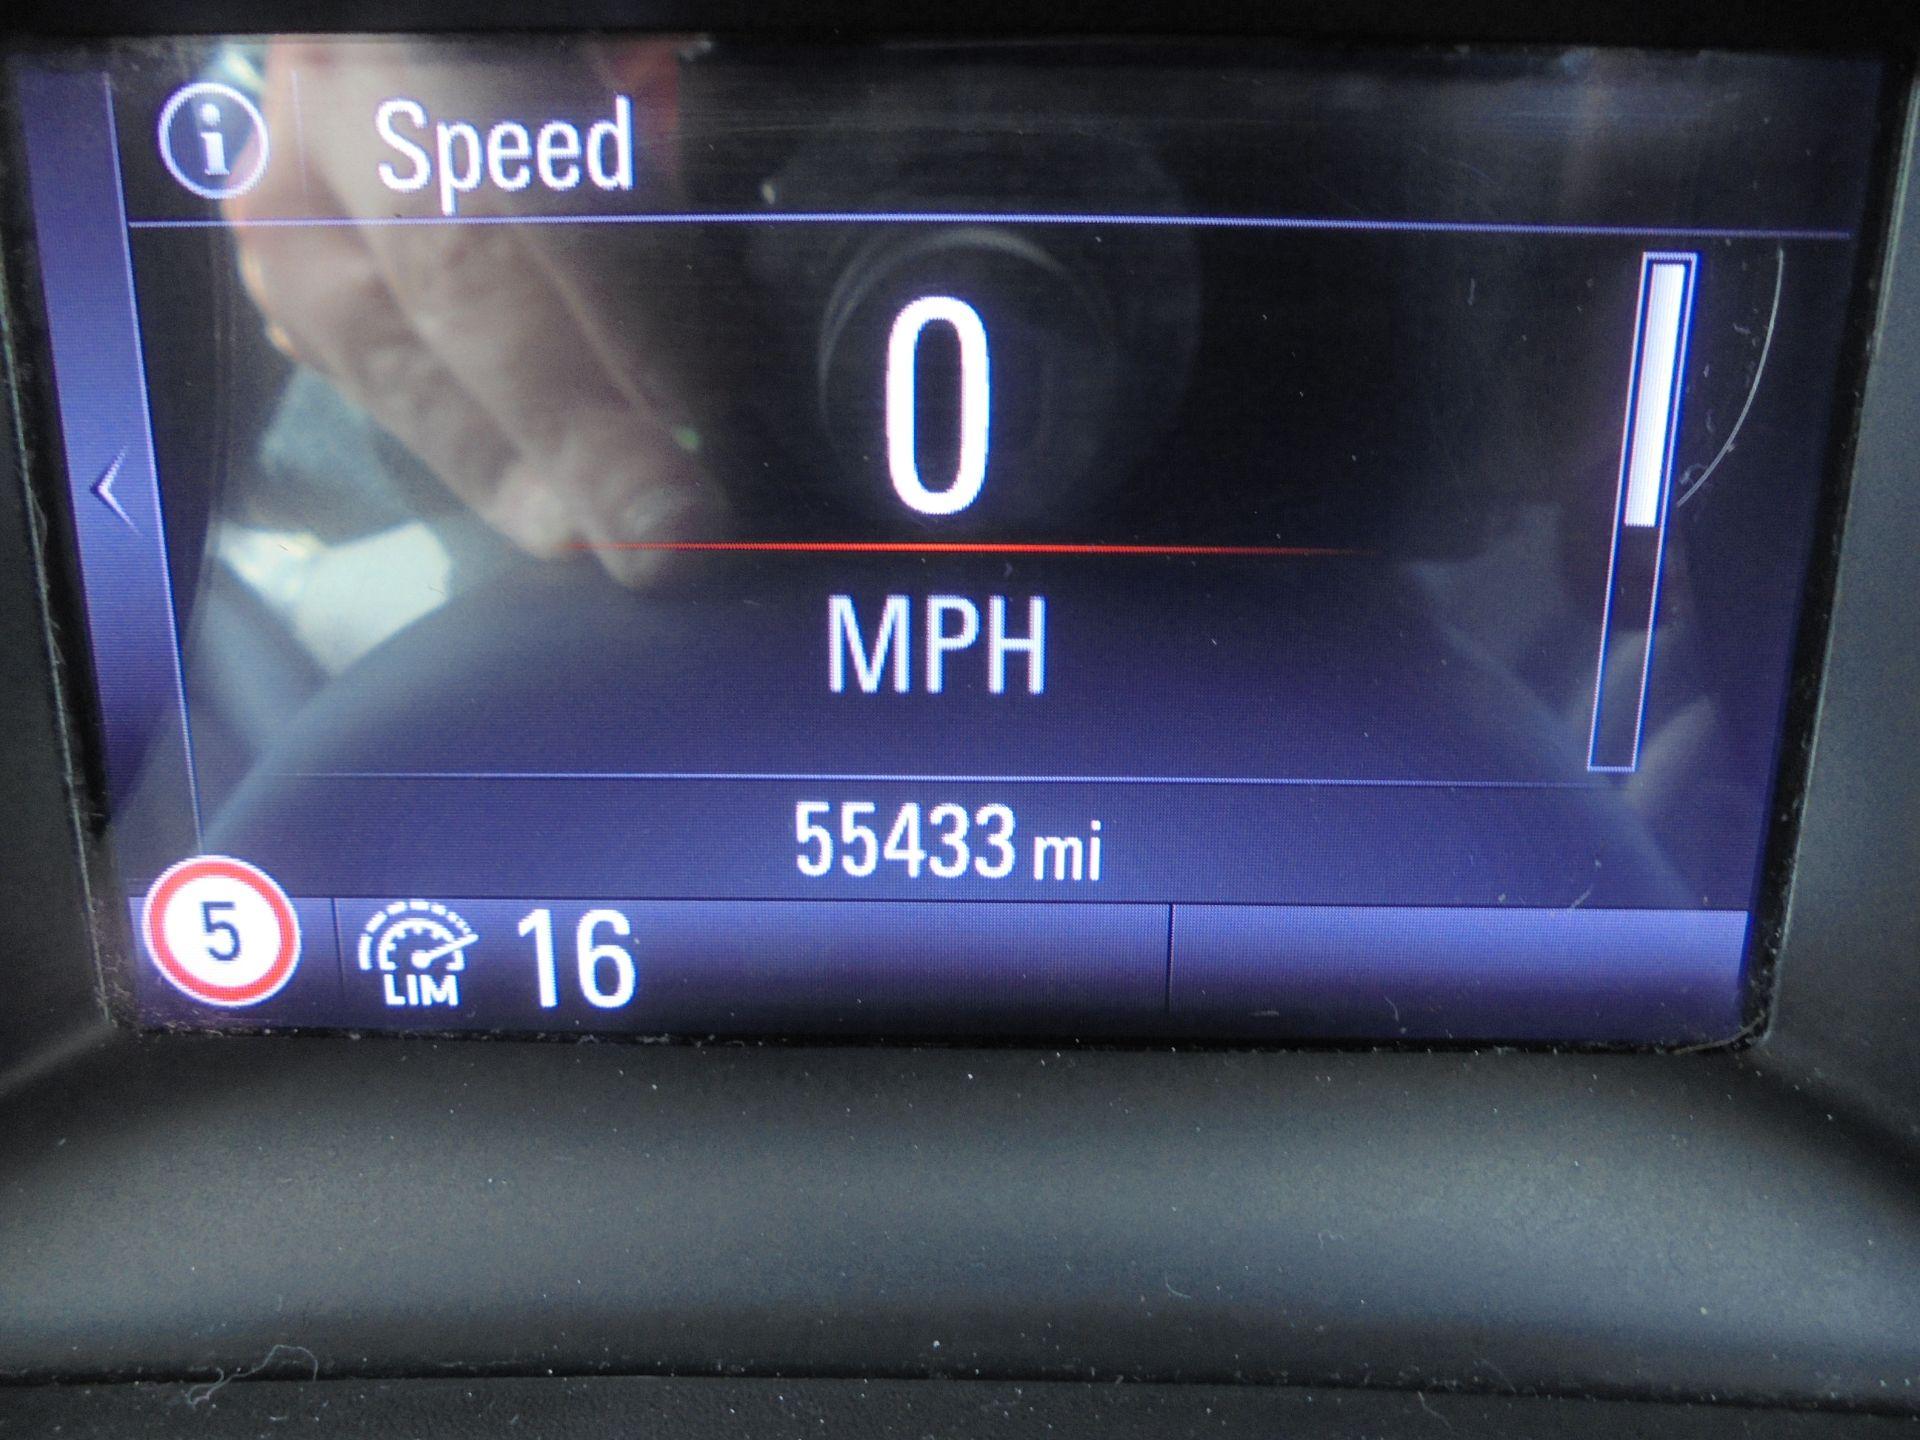 2018 Vauxhall Insignia Grand Sport 1.6 Turbo D Ecotec [136] Sri Nav 5Dr (VU18DFF) Image 13